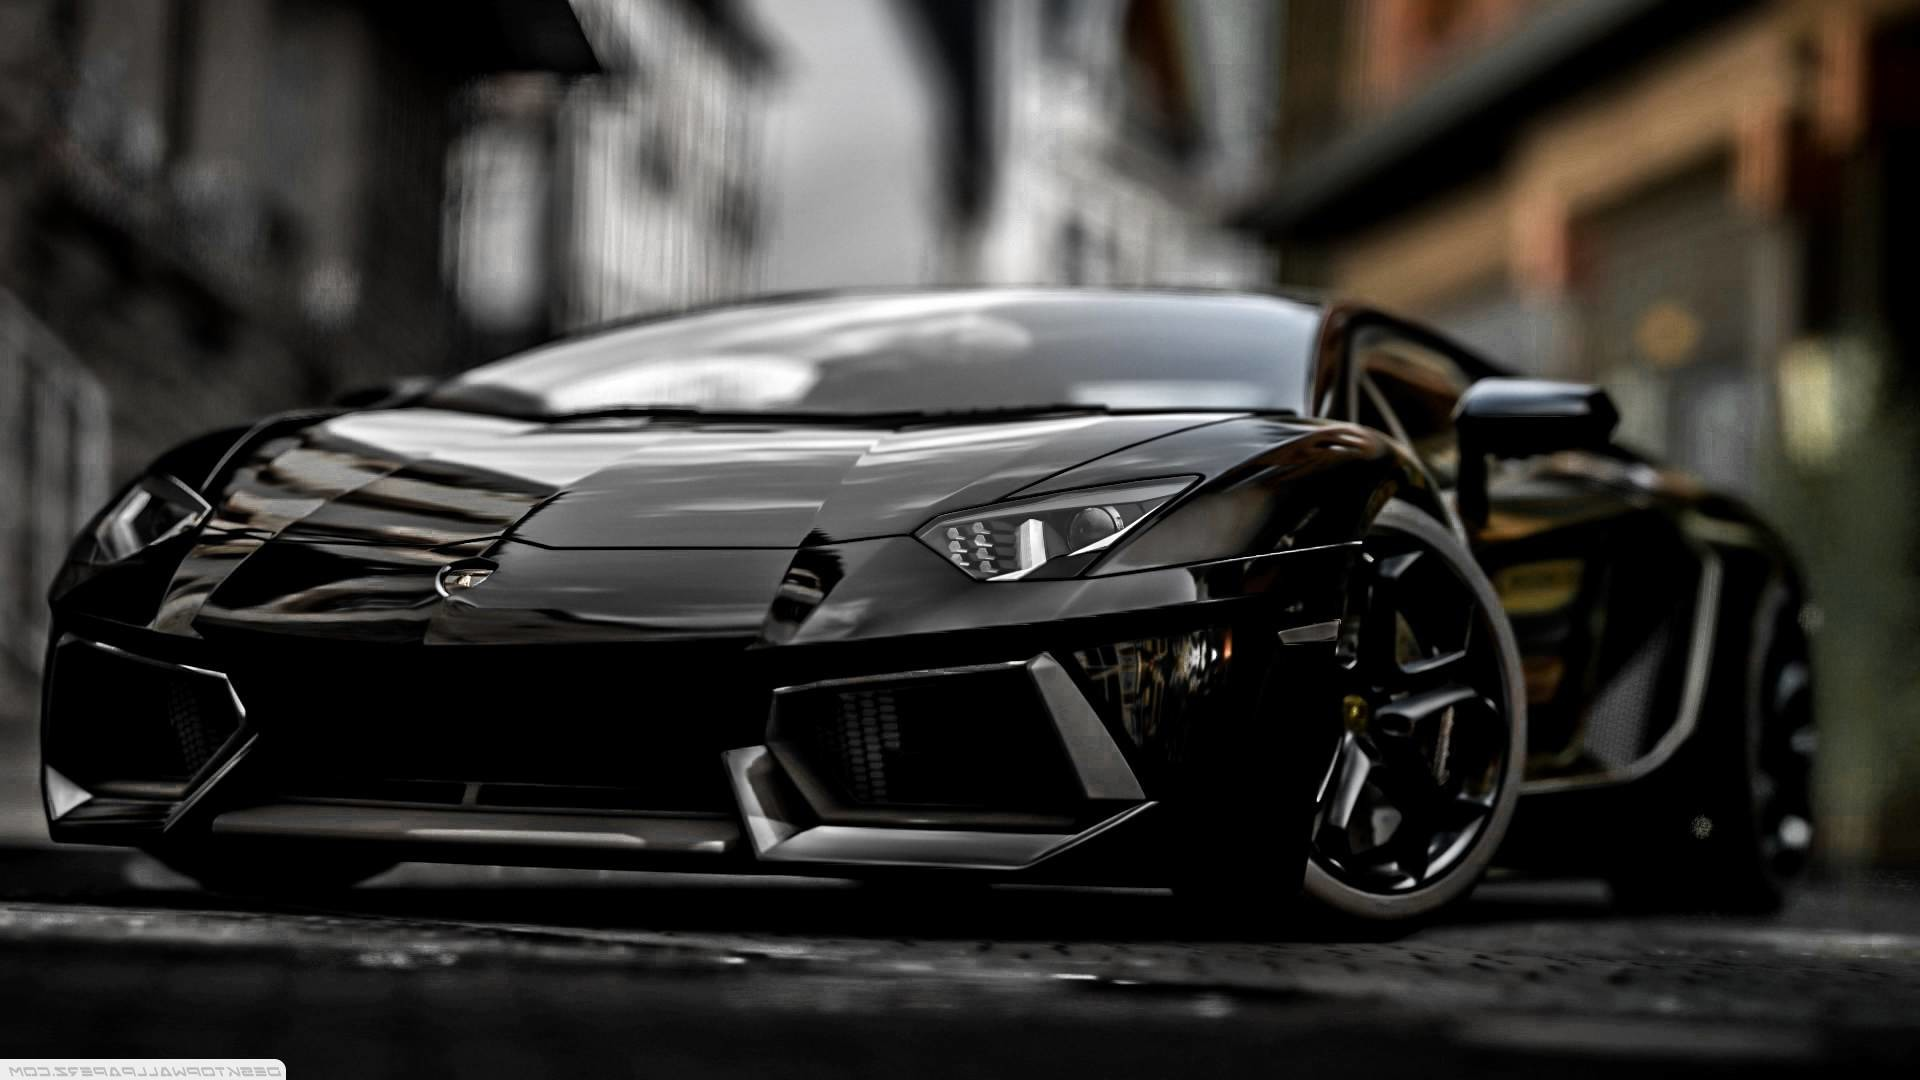 Lamborghini Veneno Wallpapers Group (92+)